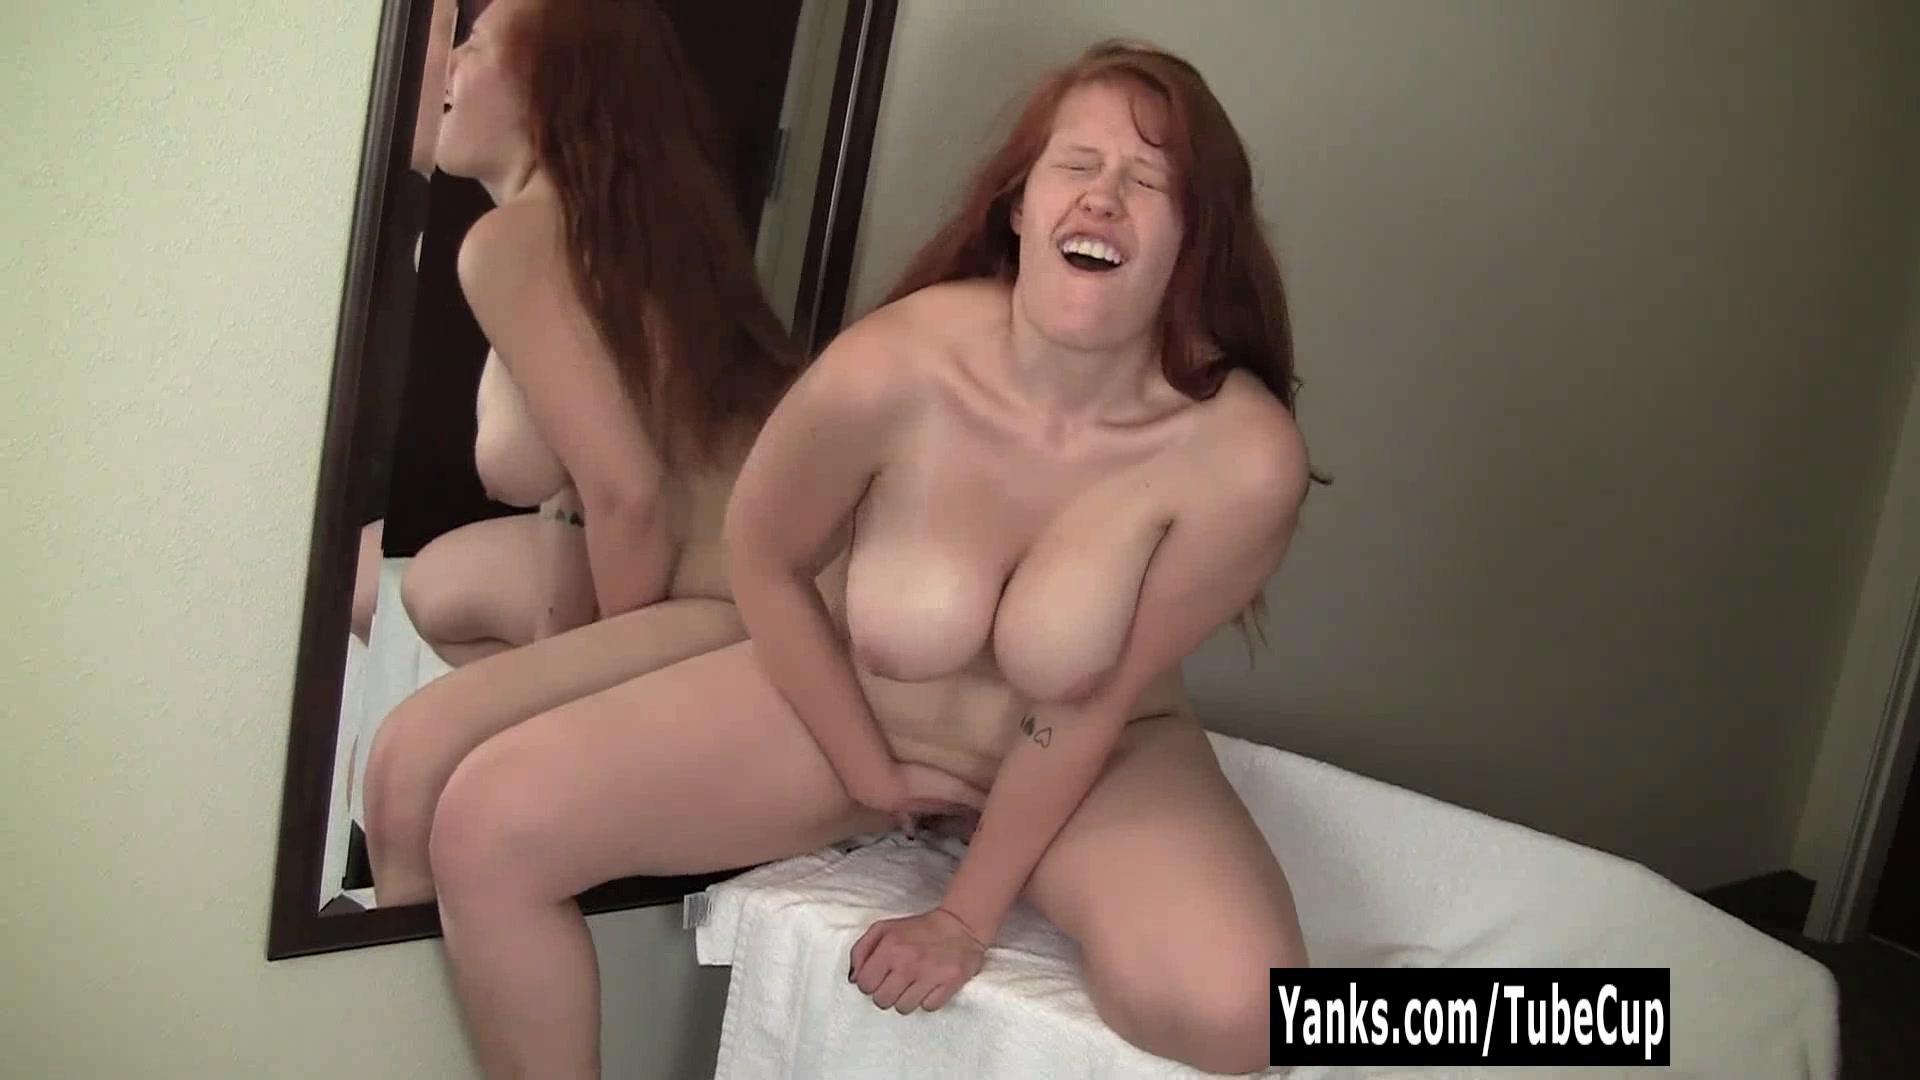 Redhead ginny masturbating her pussy tube